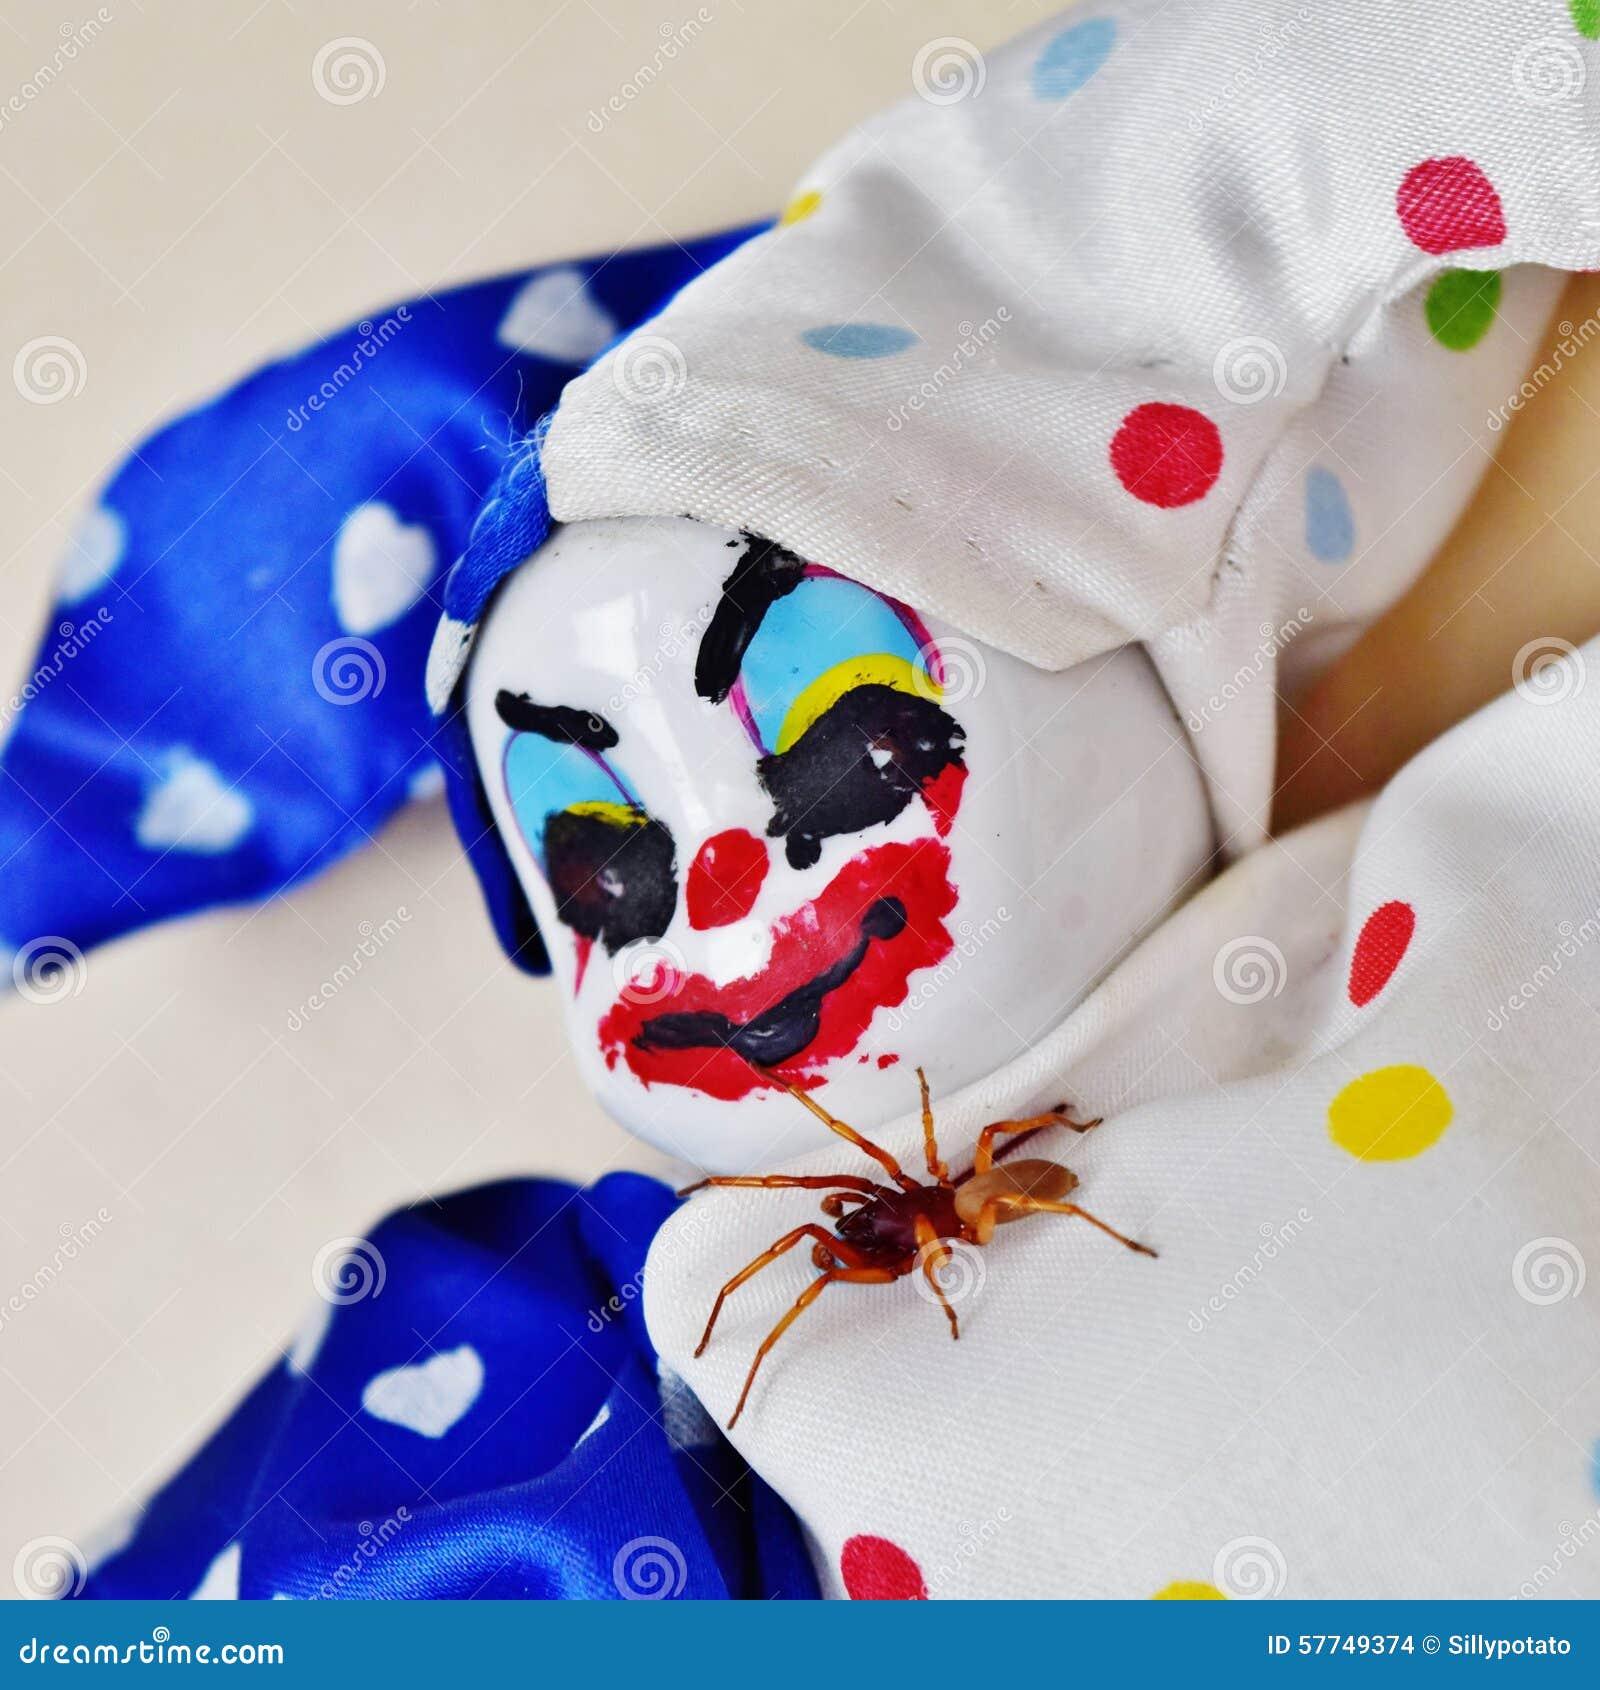 Creepy Clown Doll With Spider Friend